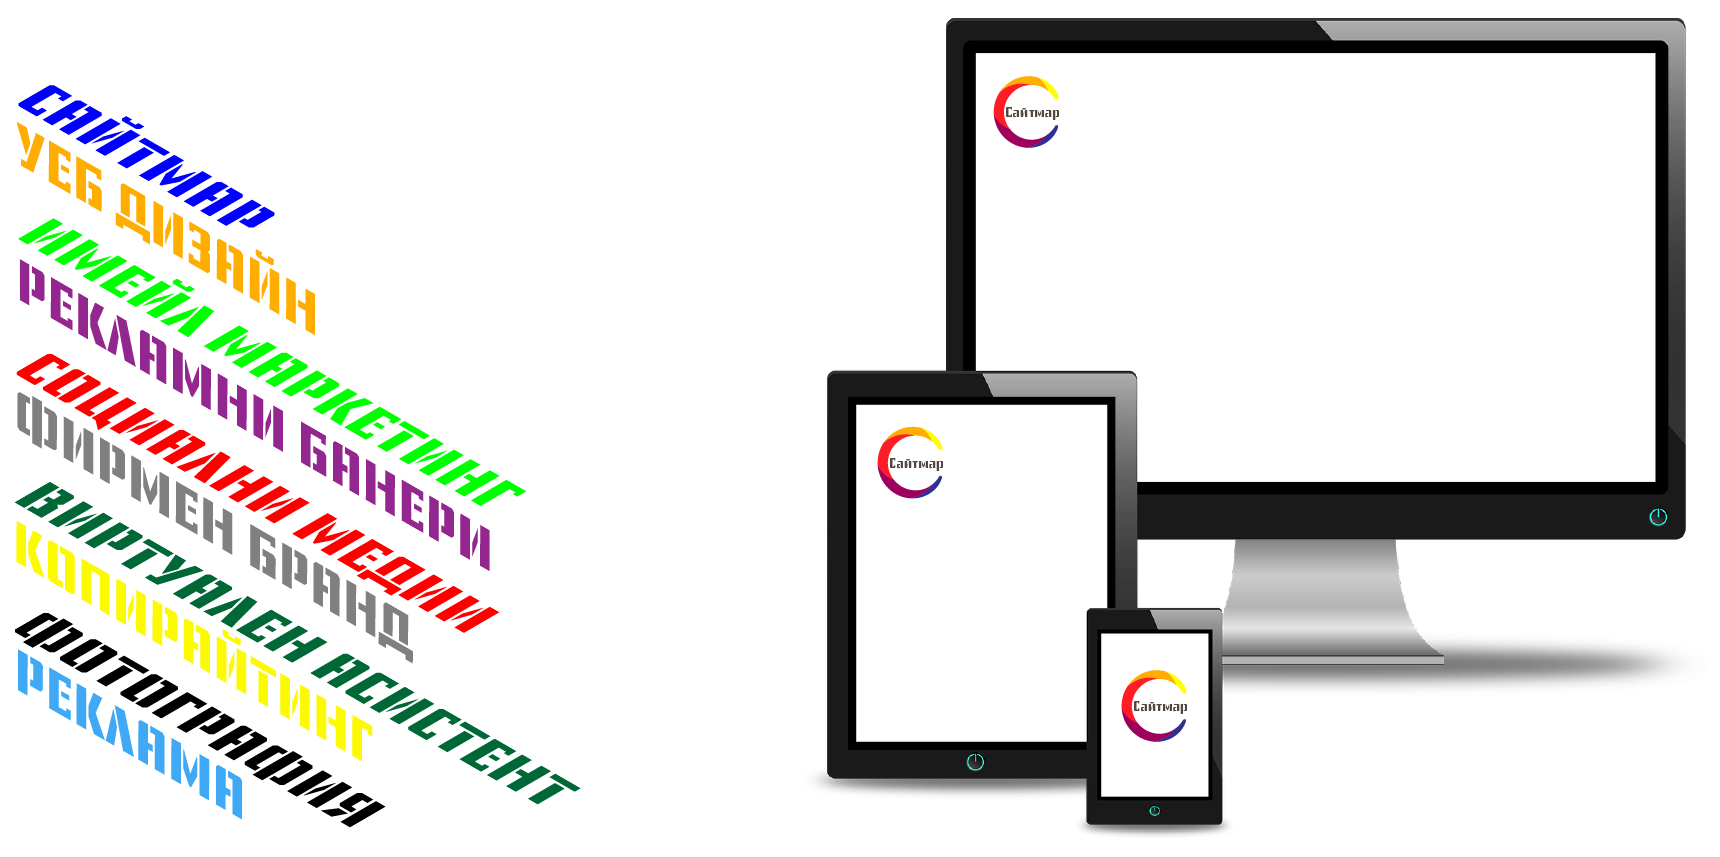 реклама банери Сайтмар Sitemar, Реклама, Дигитално студио Сайтмар | Уеб дизайн и реклама